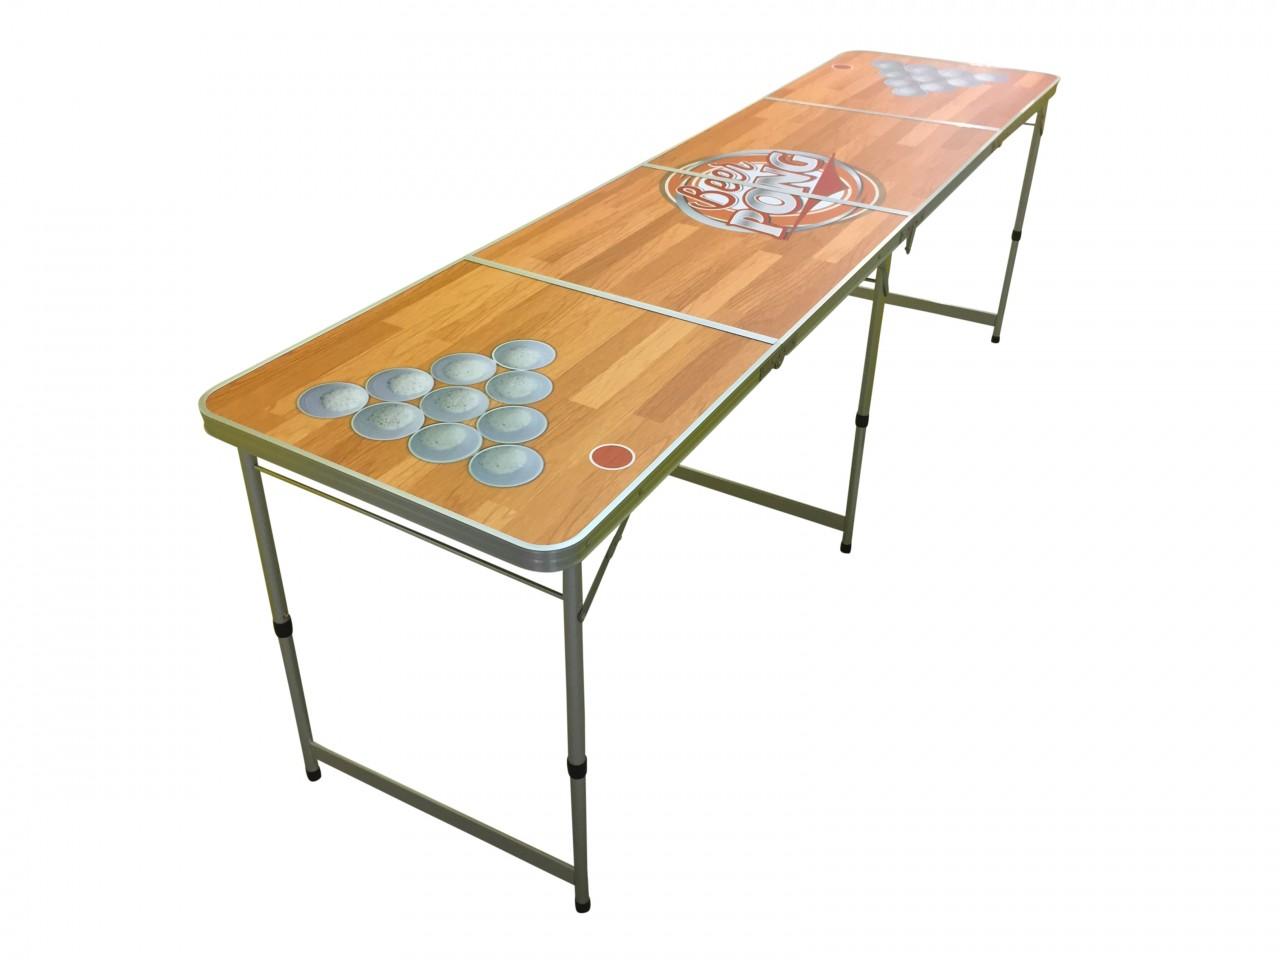 official size 8 39 foot folding beer pong 4 section table eazy goods. Black Bedroom Furniture Sets. Home Design Ideas